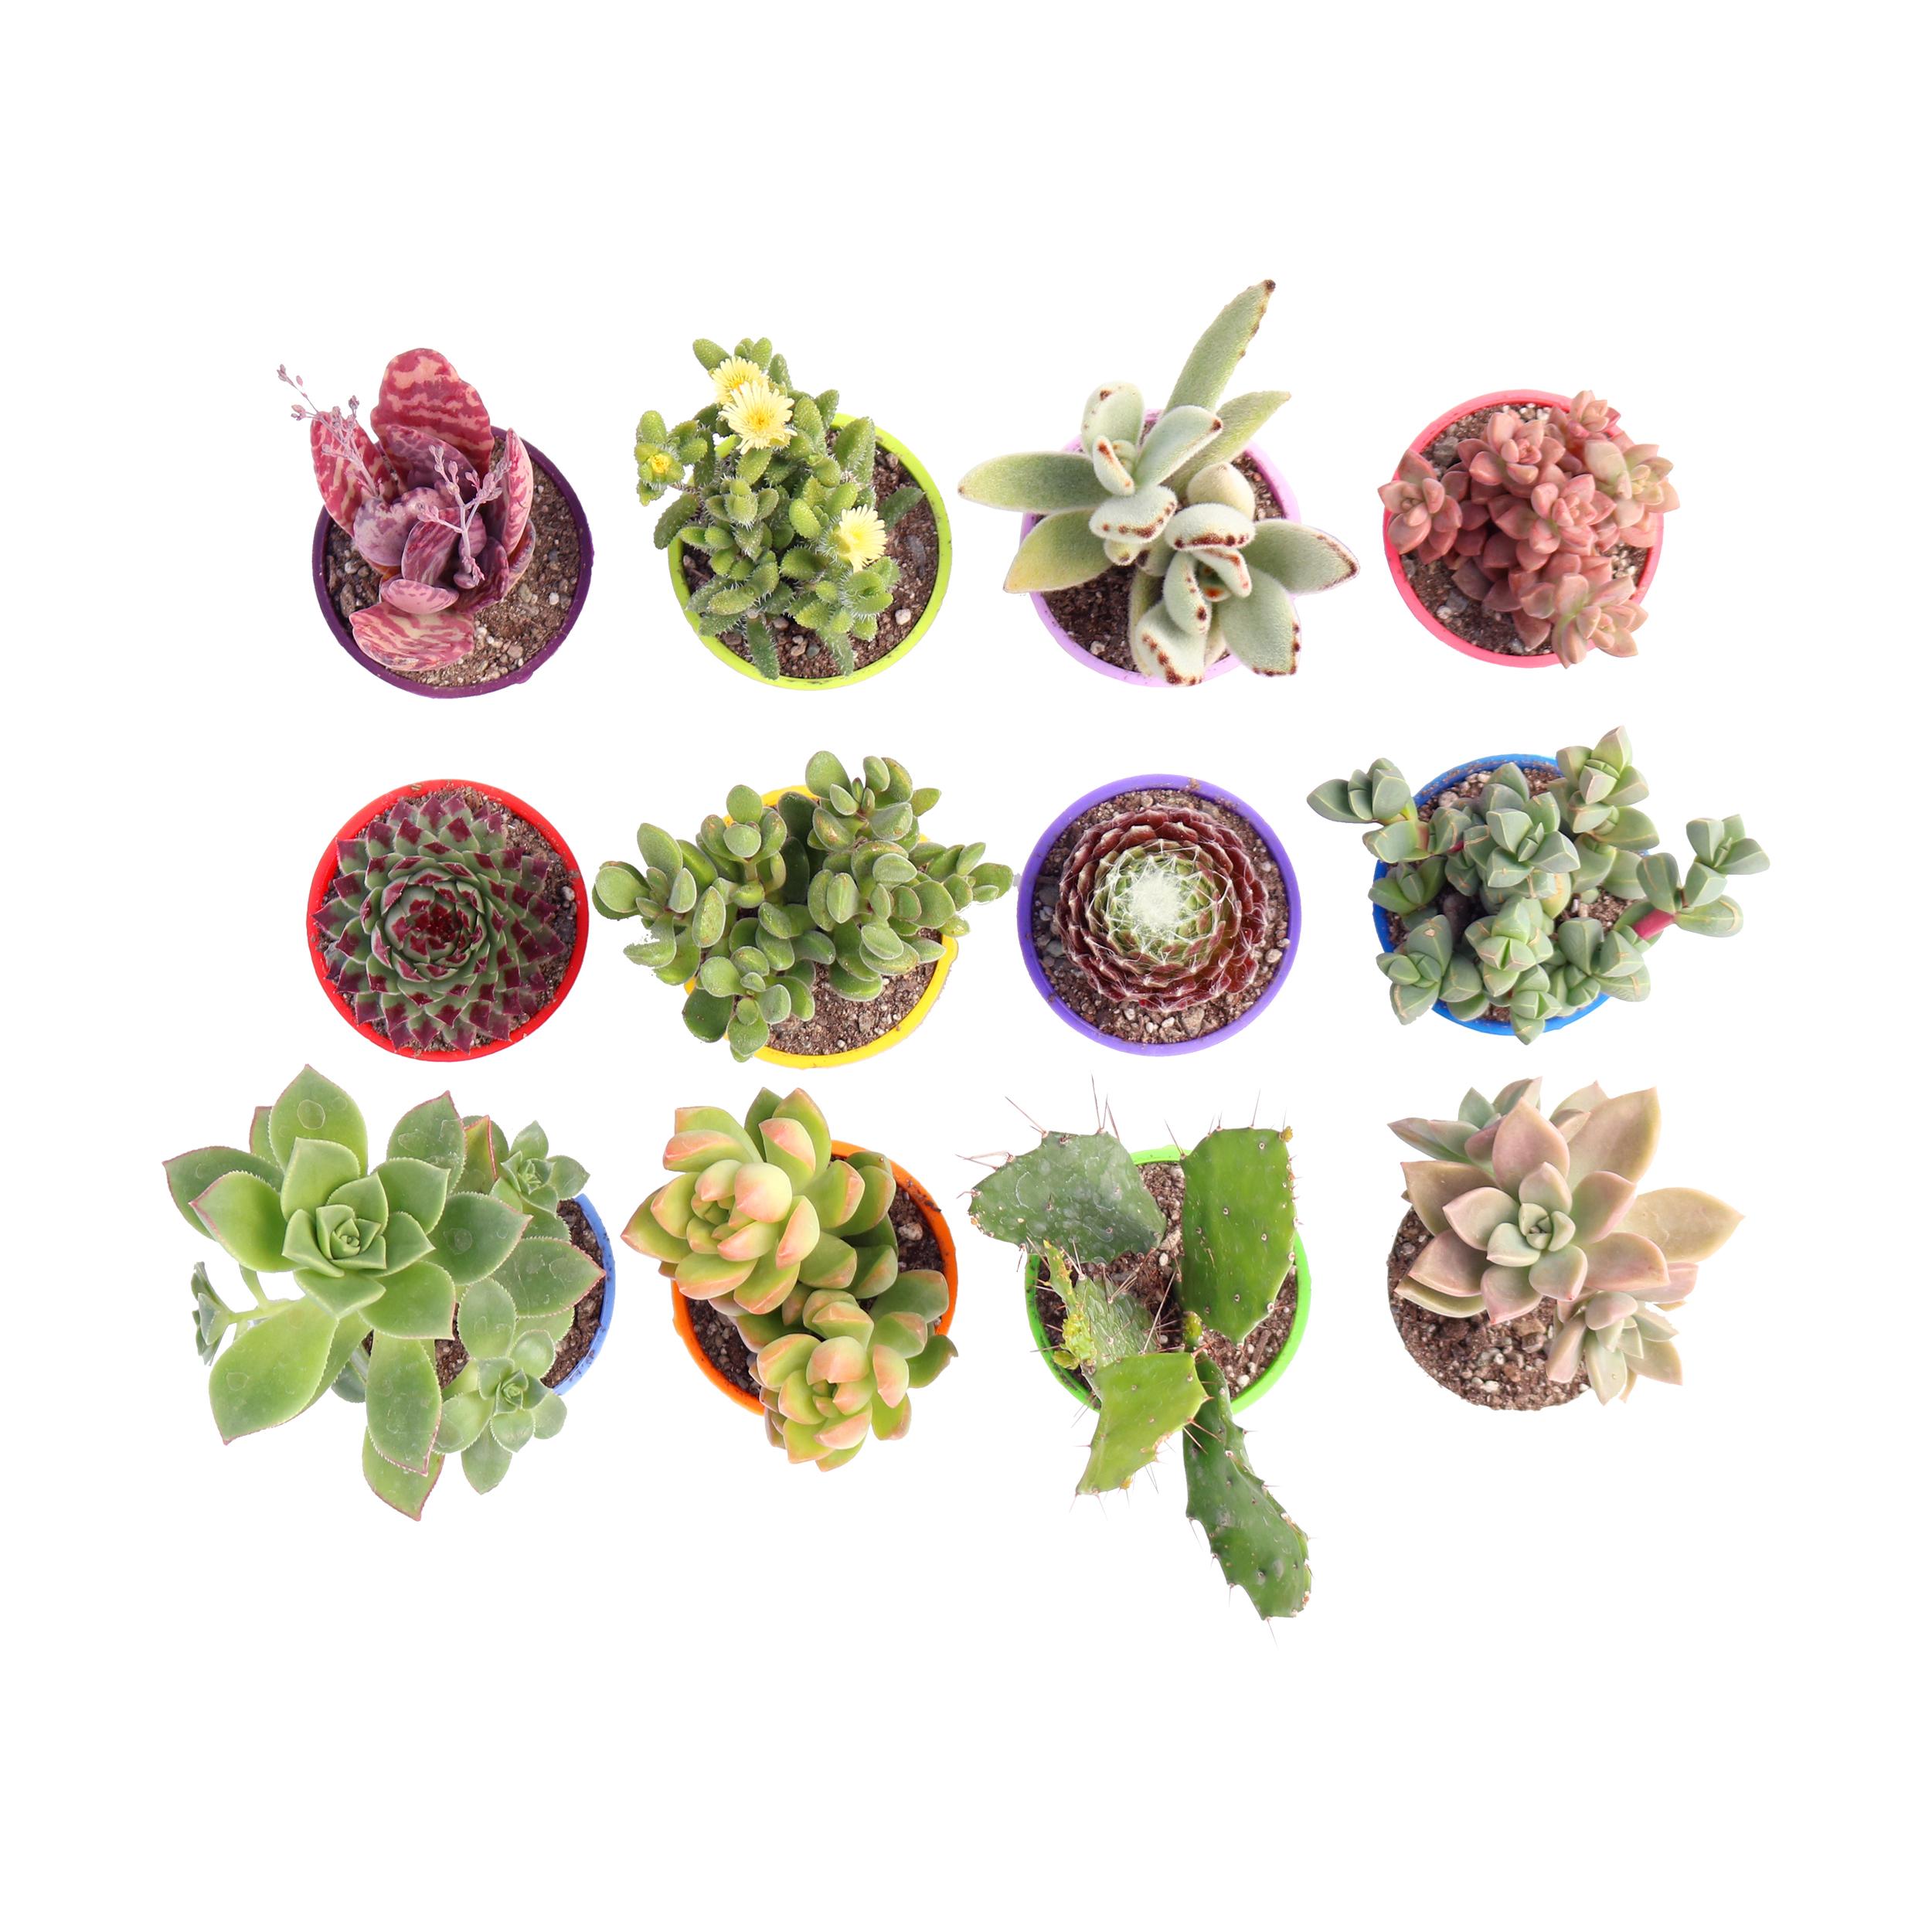 گیاه طبیعی کاکتوس و ساکولنت آیدین کاکتوس کد CB-004 بسته 12 عددی main 1 2